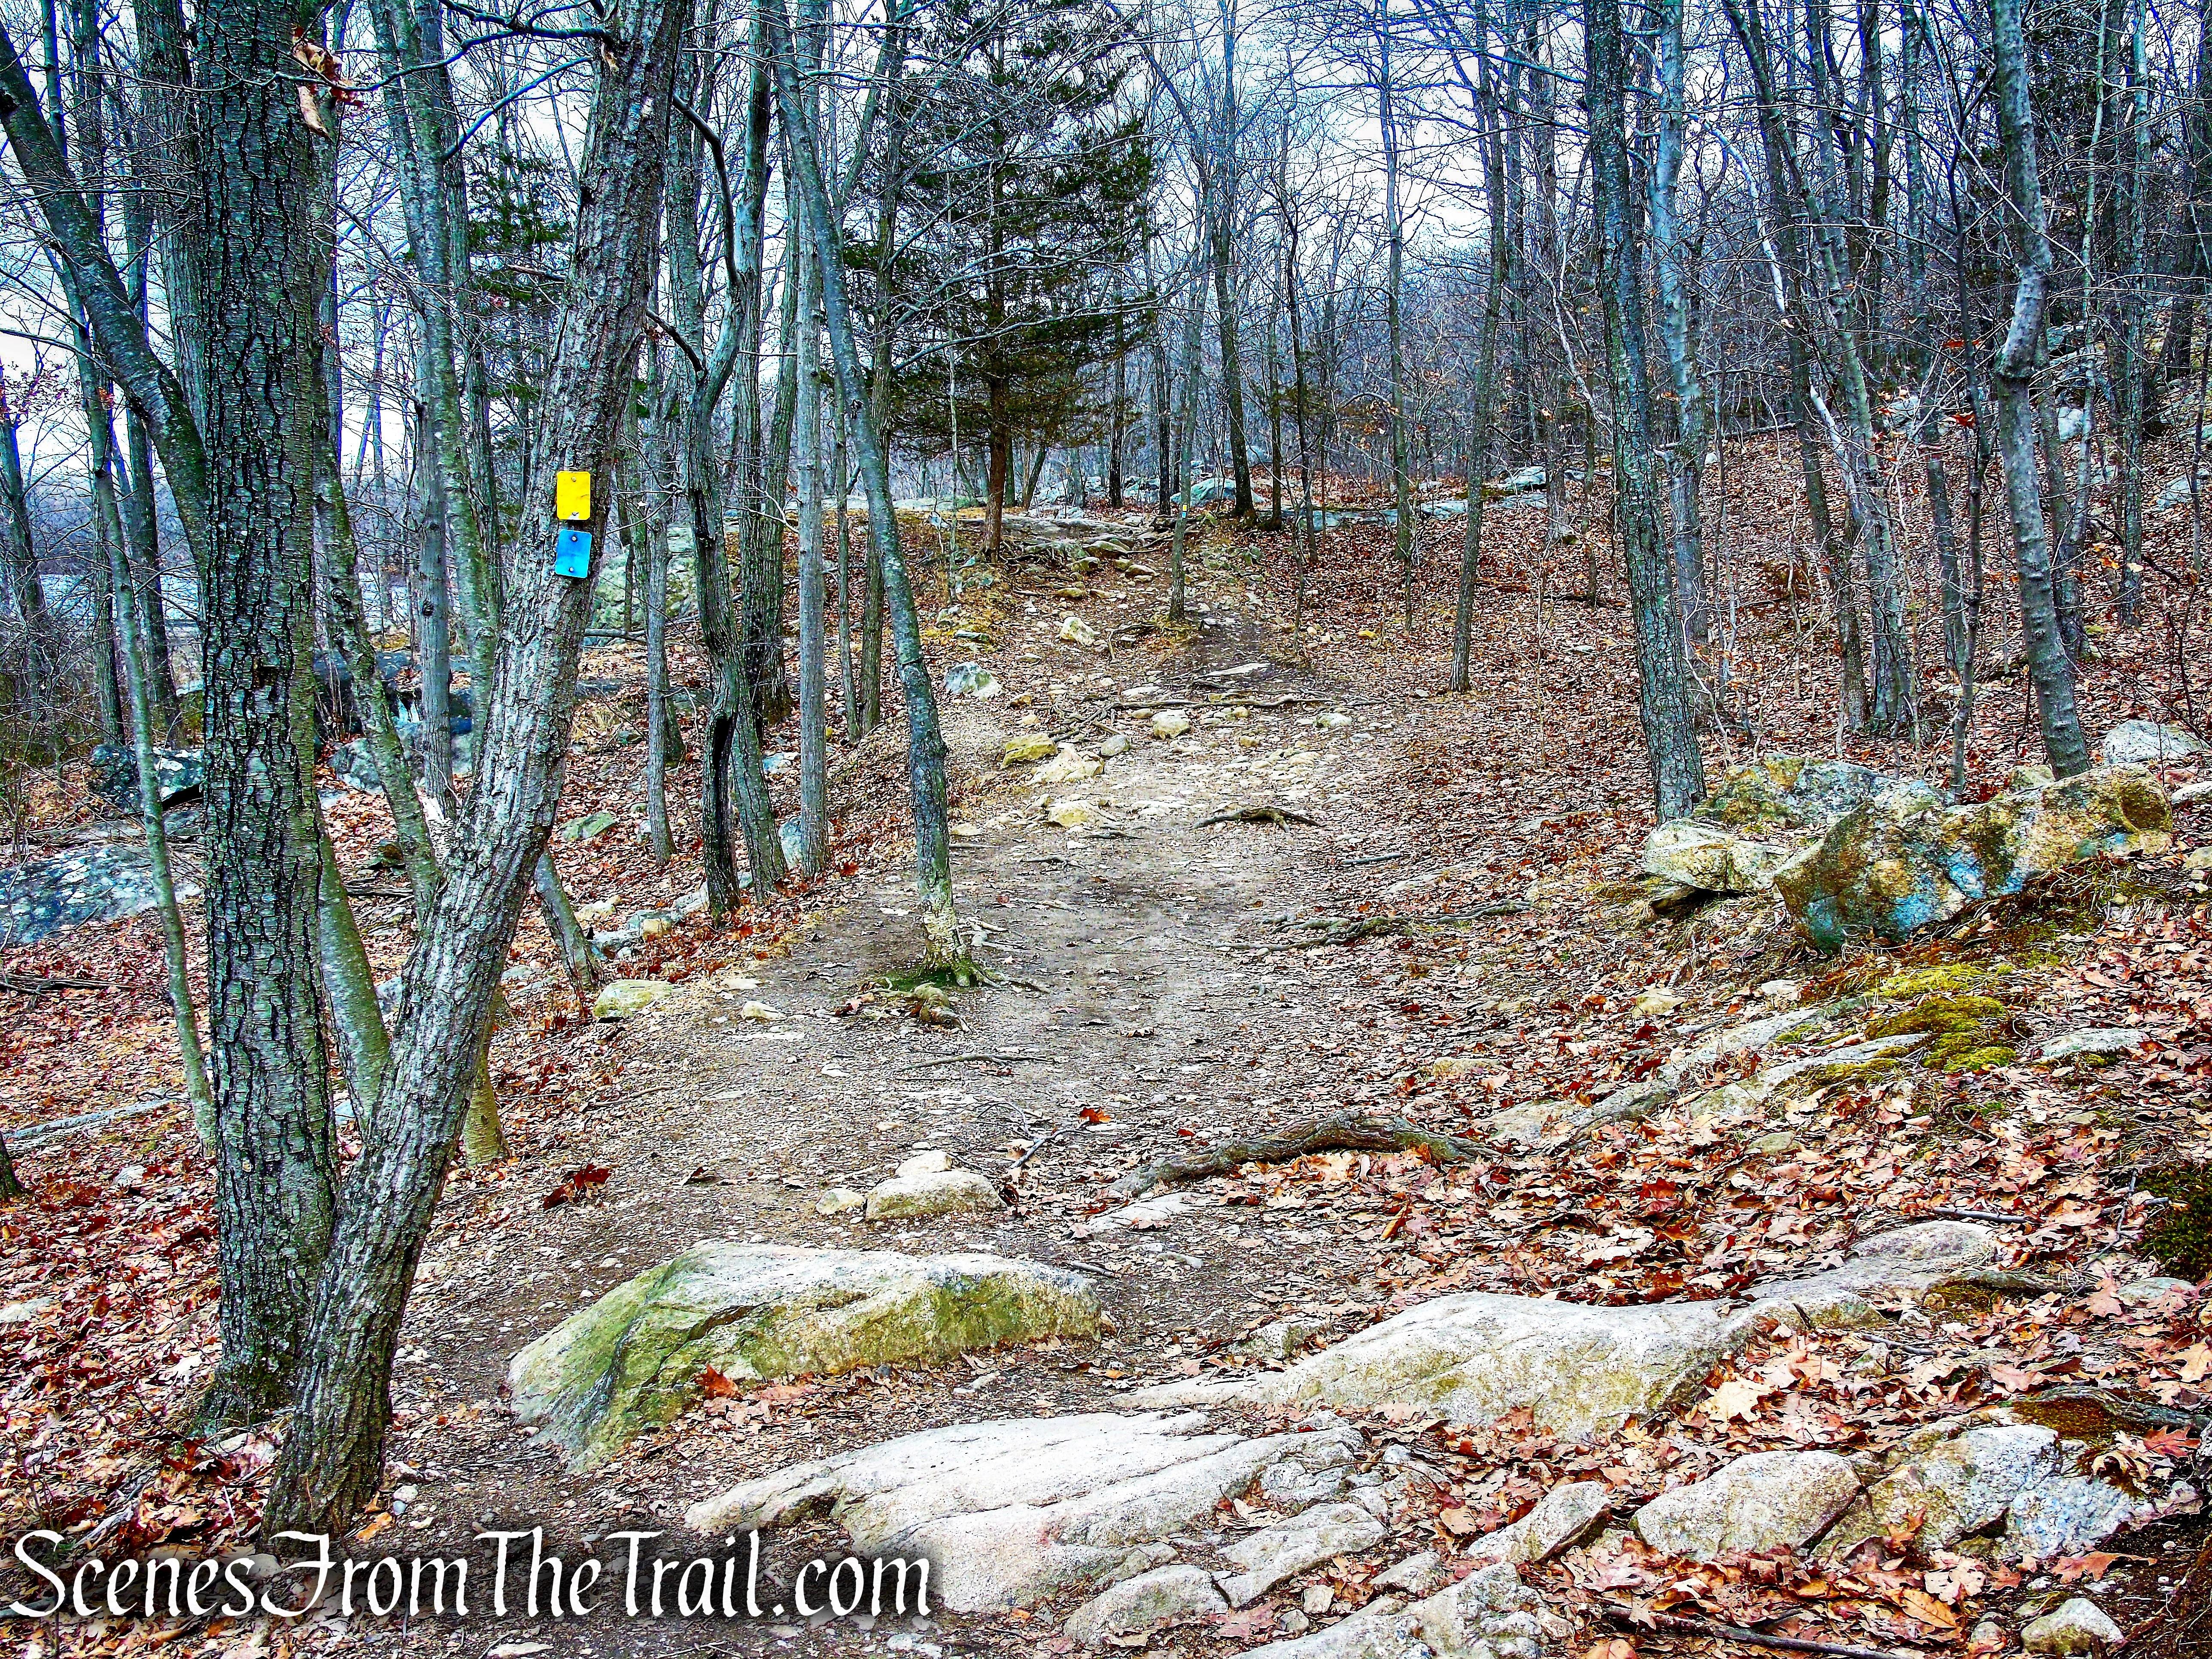 MacEvoy Trail